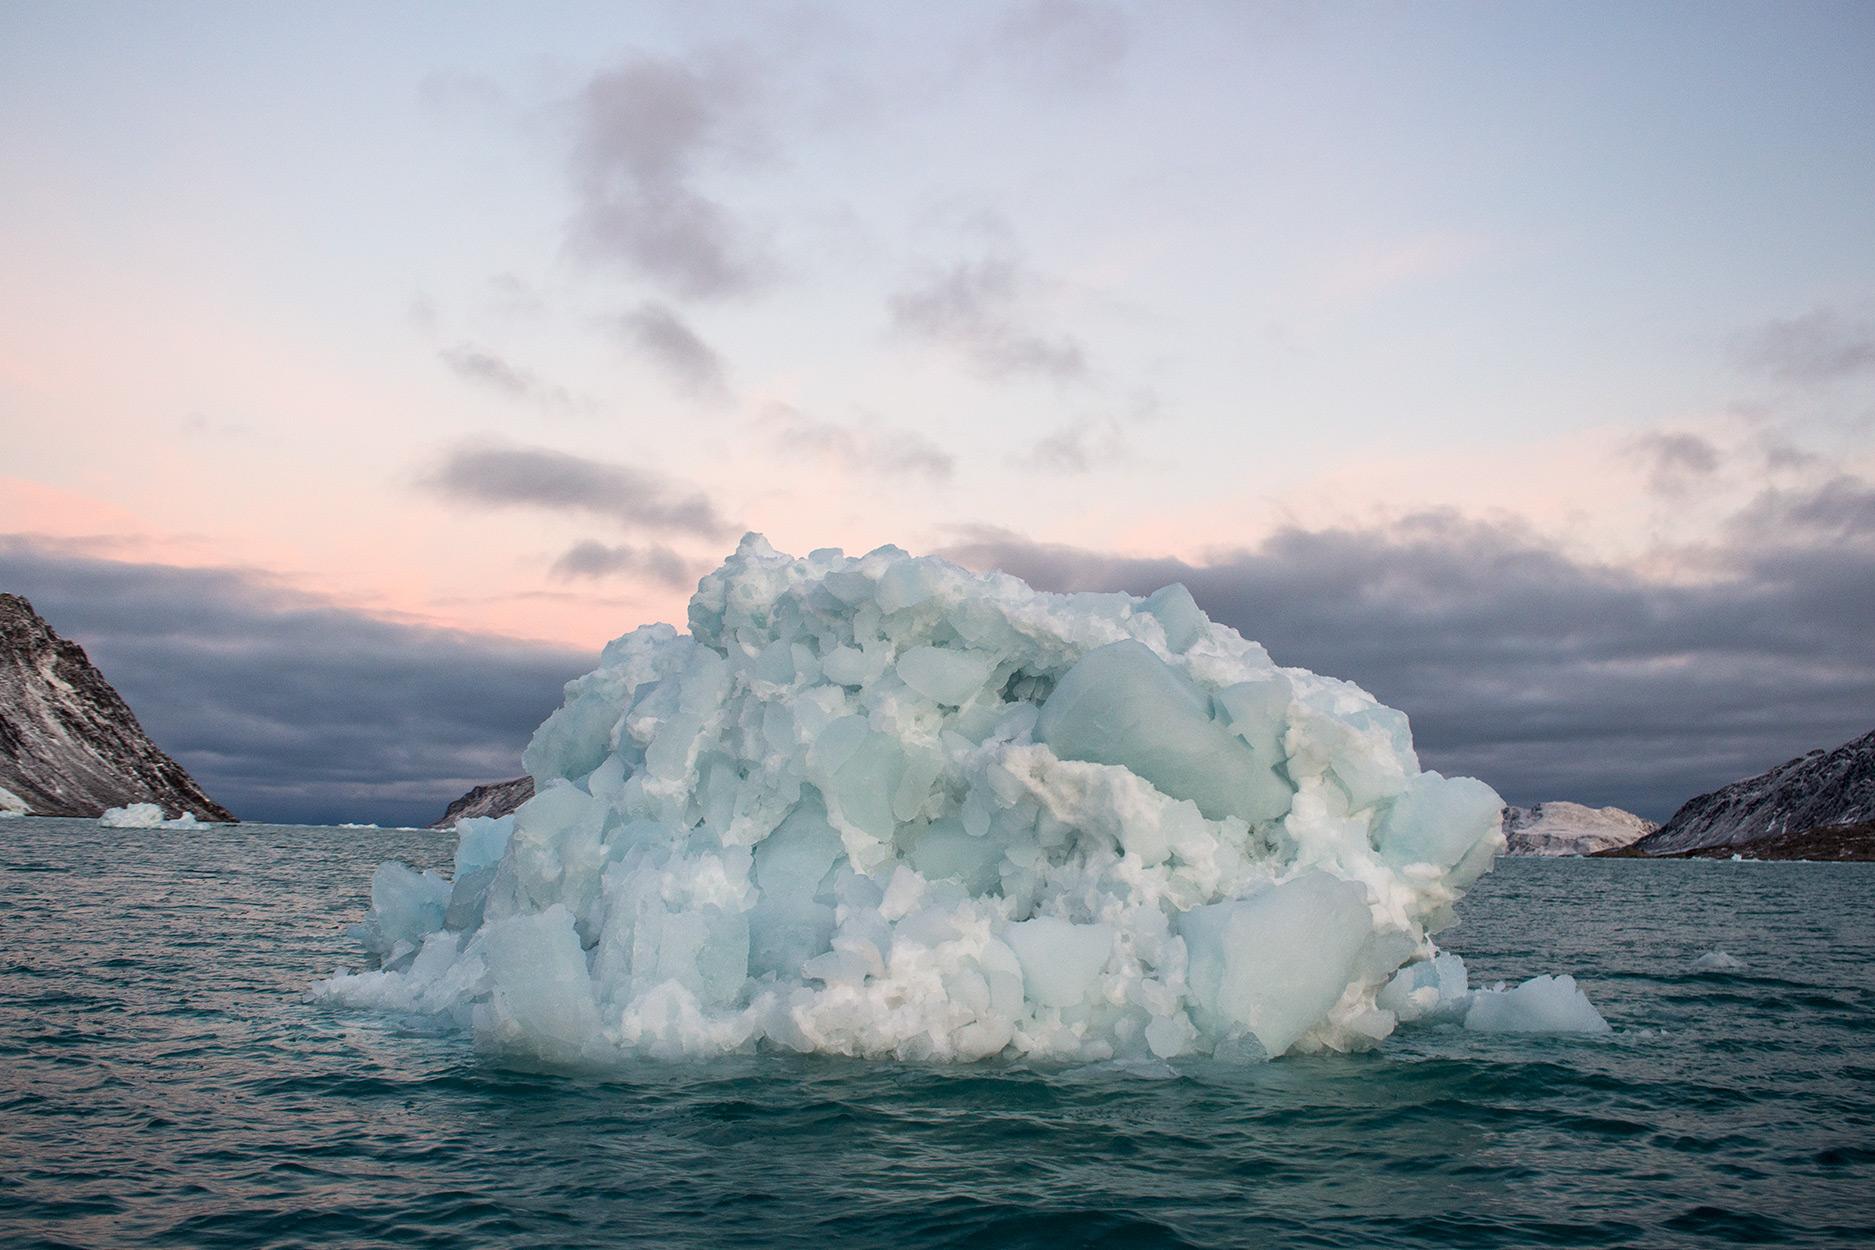 Iceberg in Fuglefjorden, Svalbard